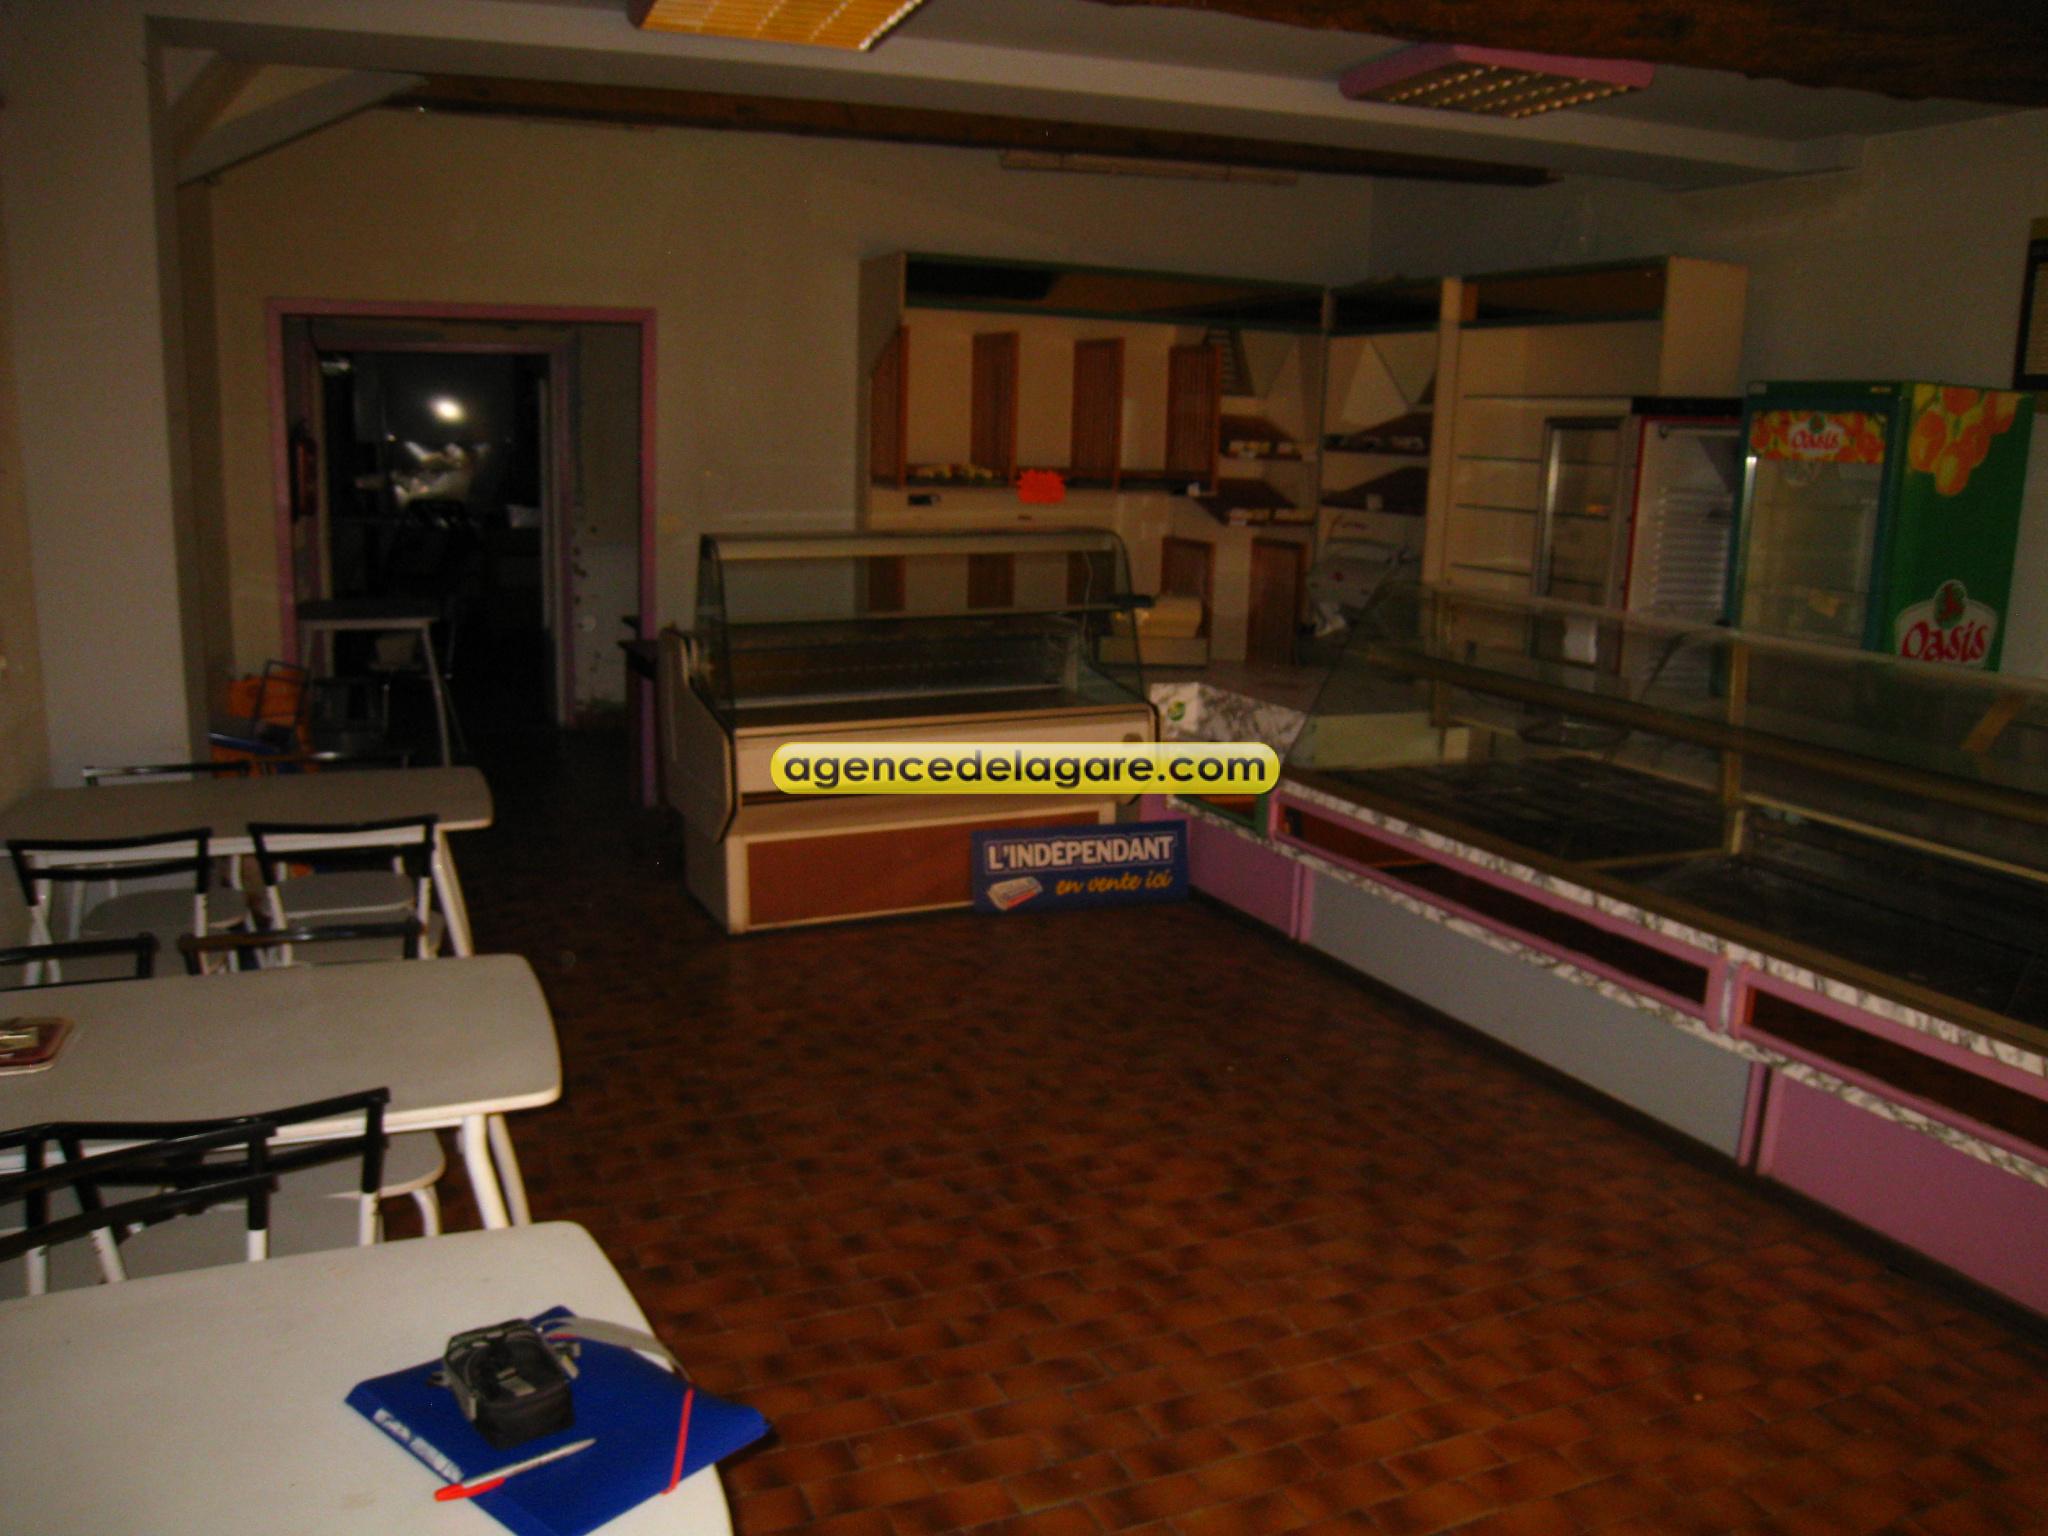 Local commercial / www.agencedelagare.com